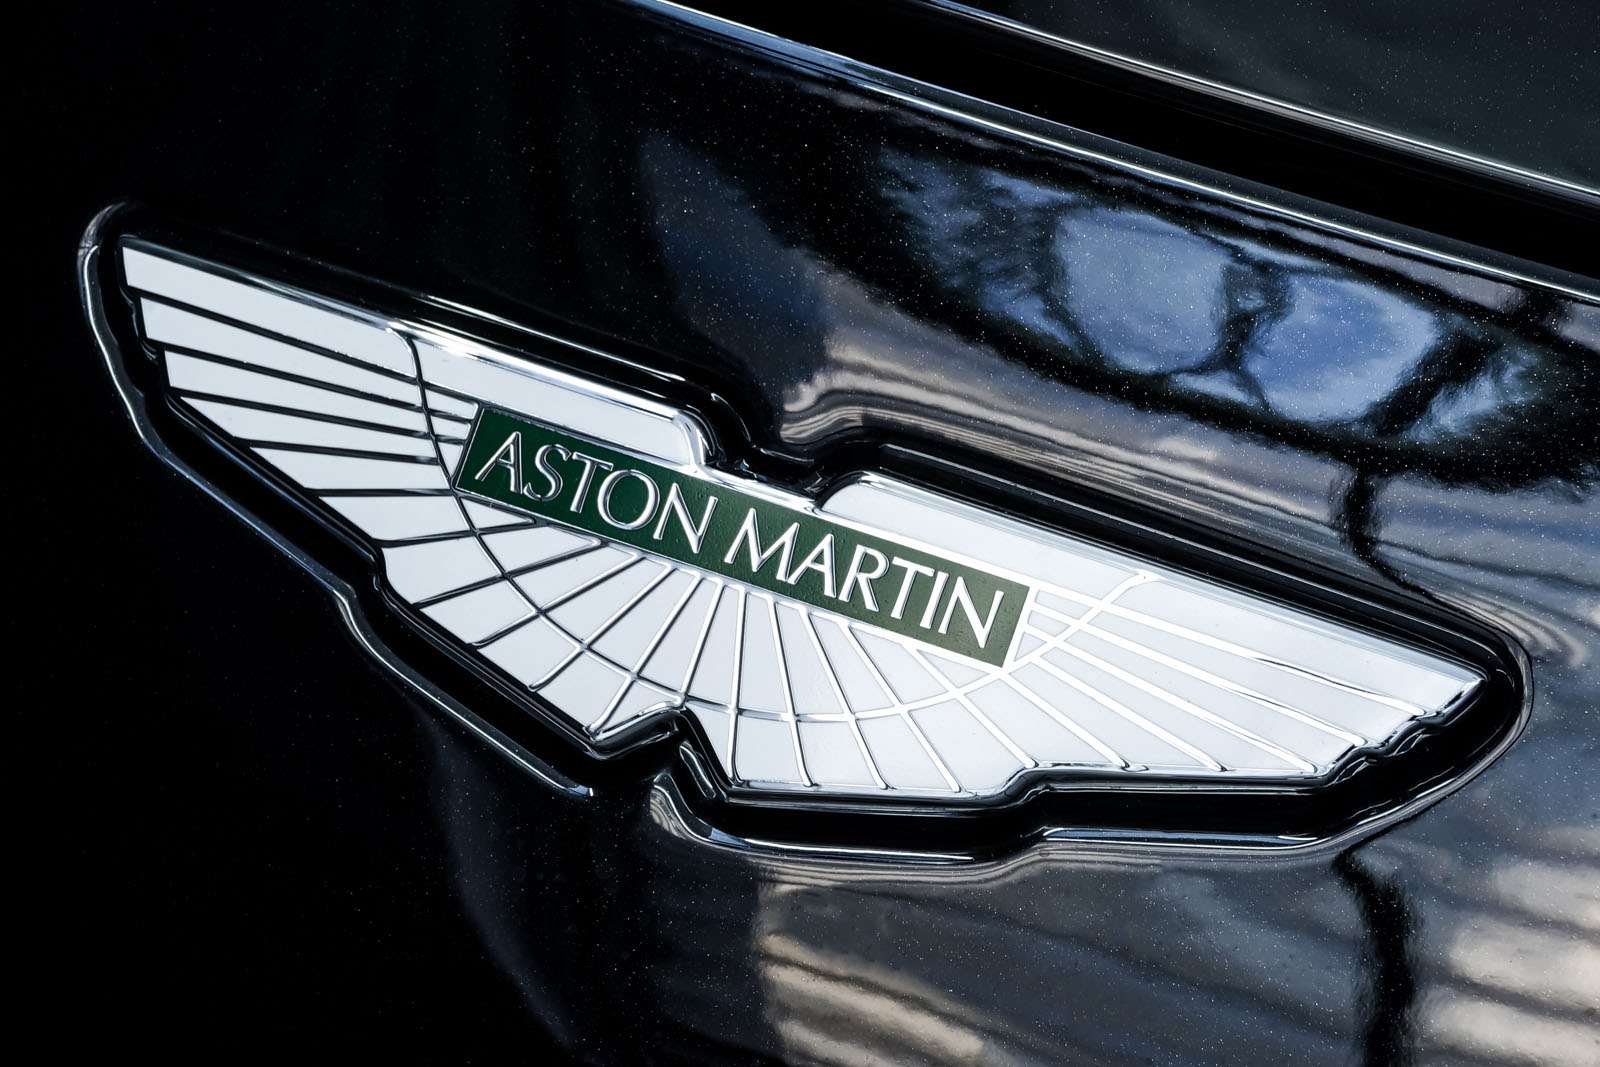 AstonMartin_V8_Vantage_Schwarz_Schwarz_AM-1849_11_w